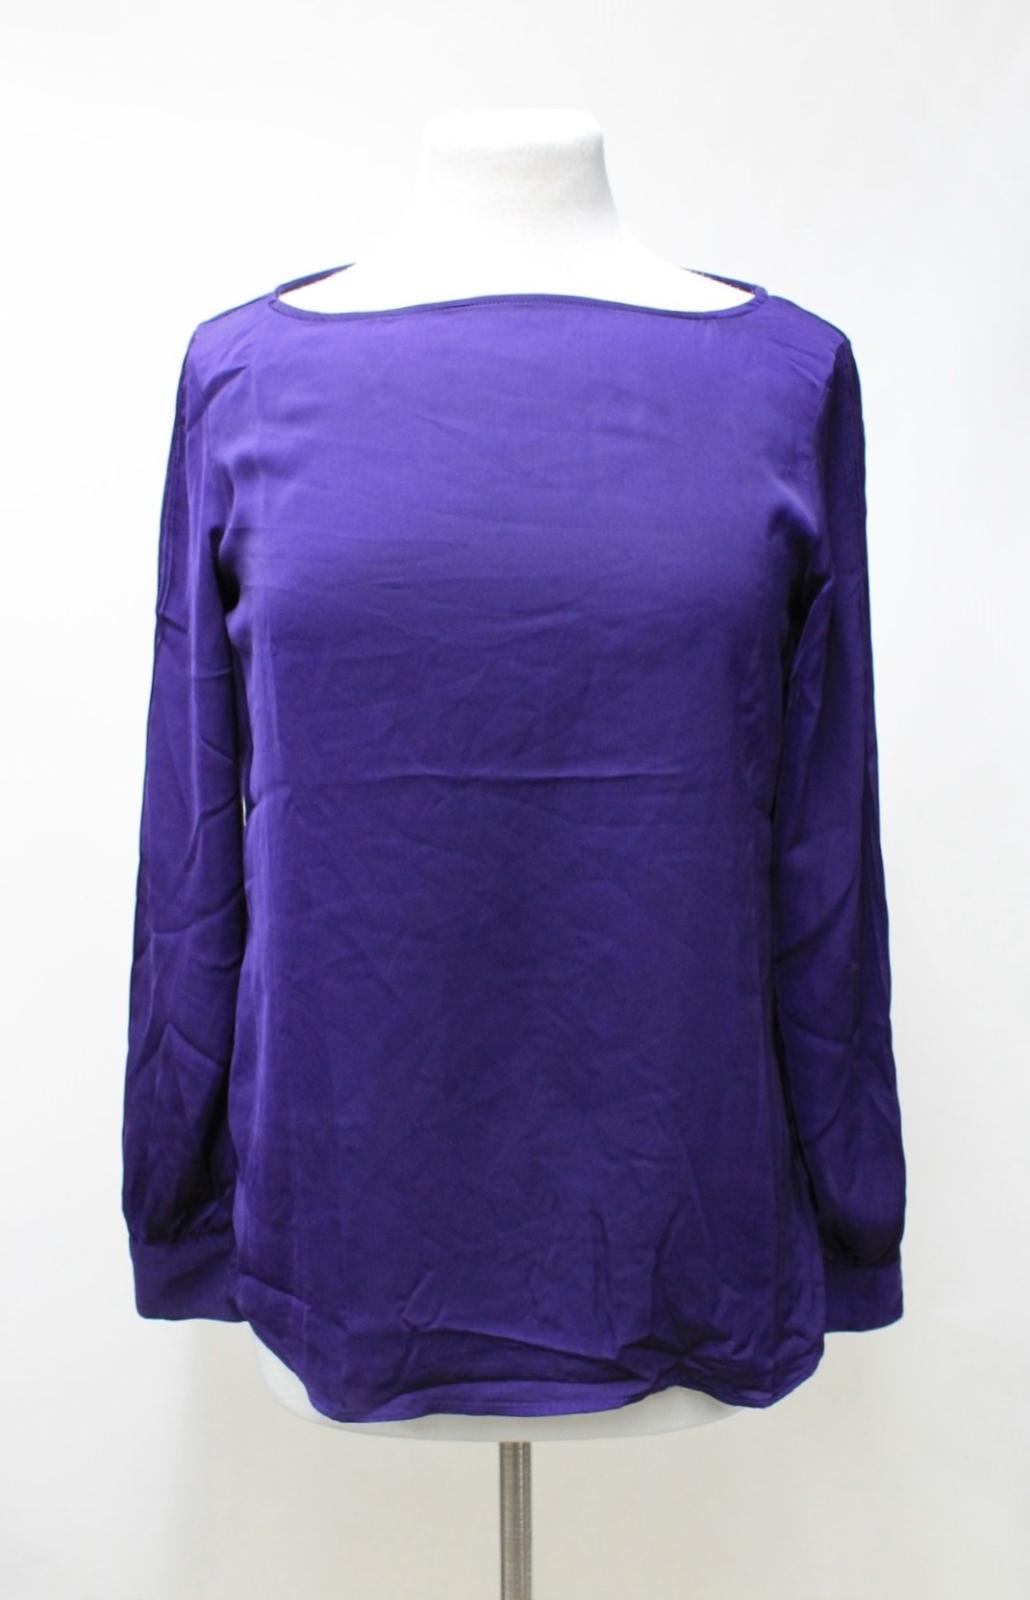 LAUREN-BY-RALPH-LAUREN-Ladies-Purple-Satin-Pleated-Sleeve-Round-Neck-Top-S thumbnail 2